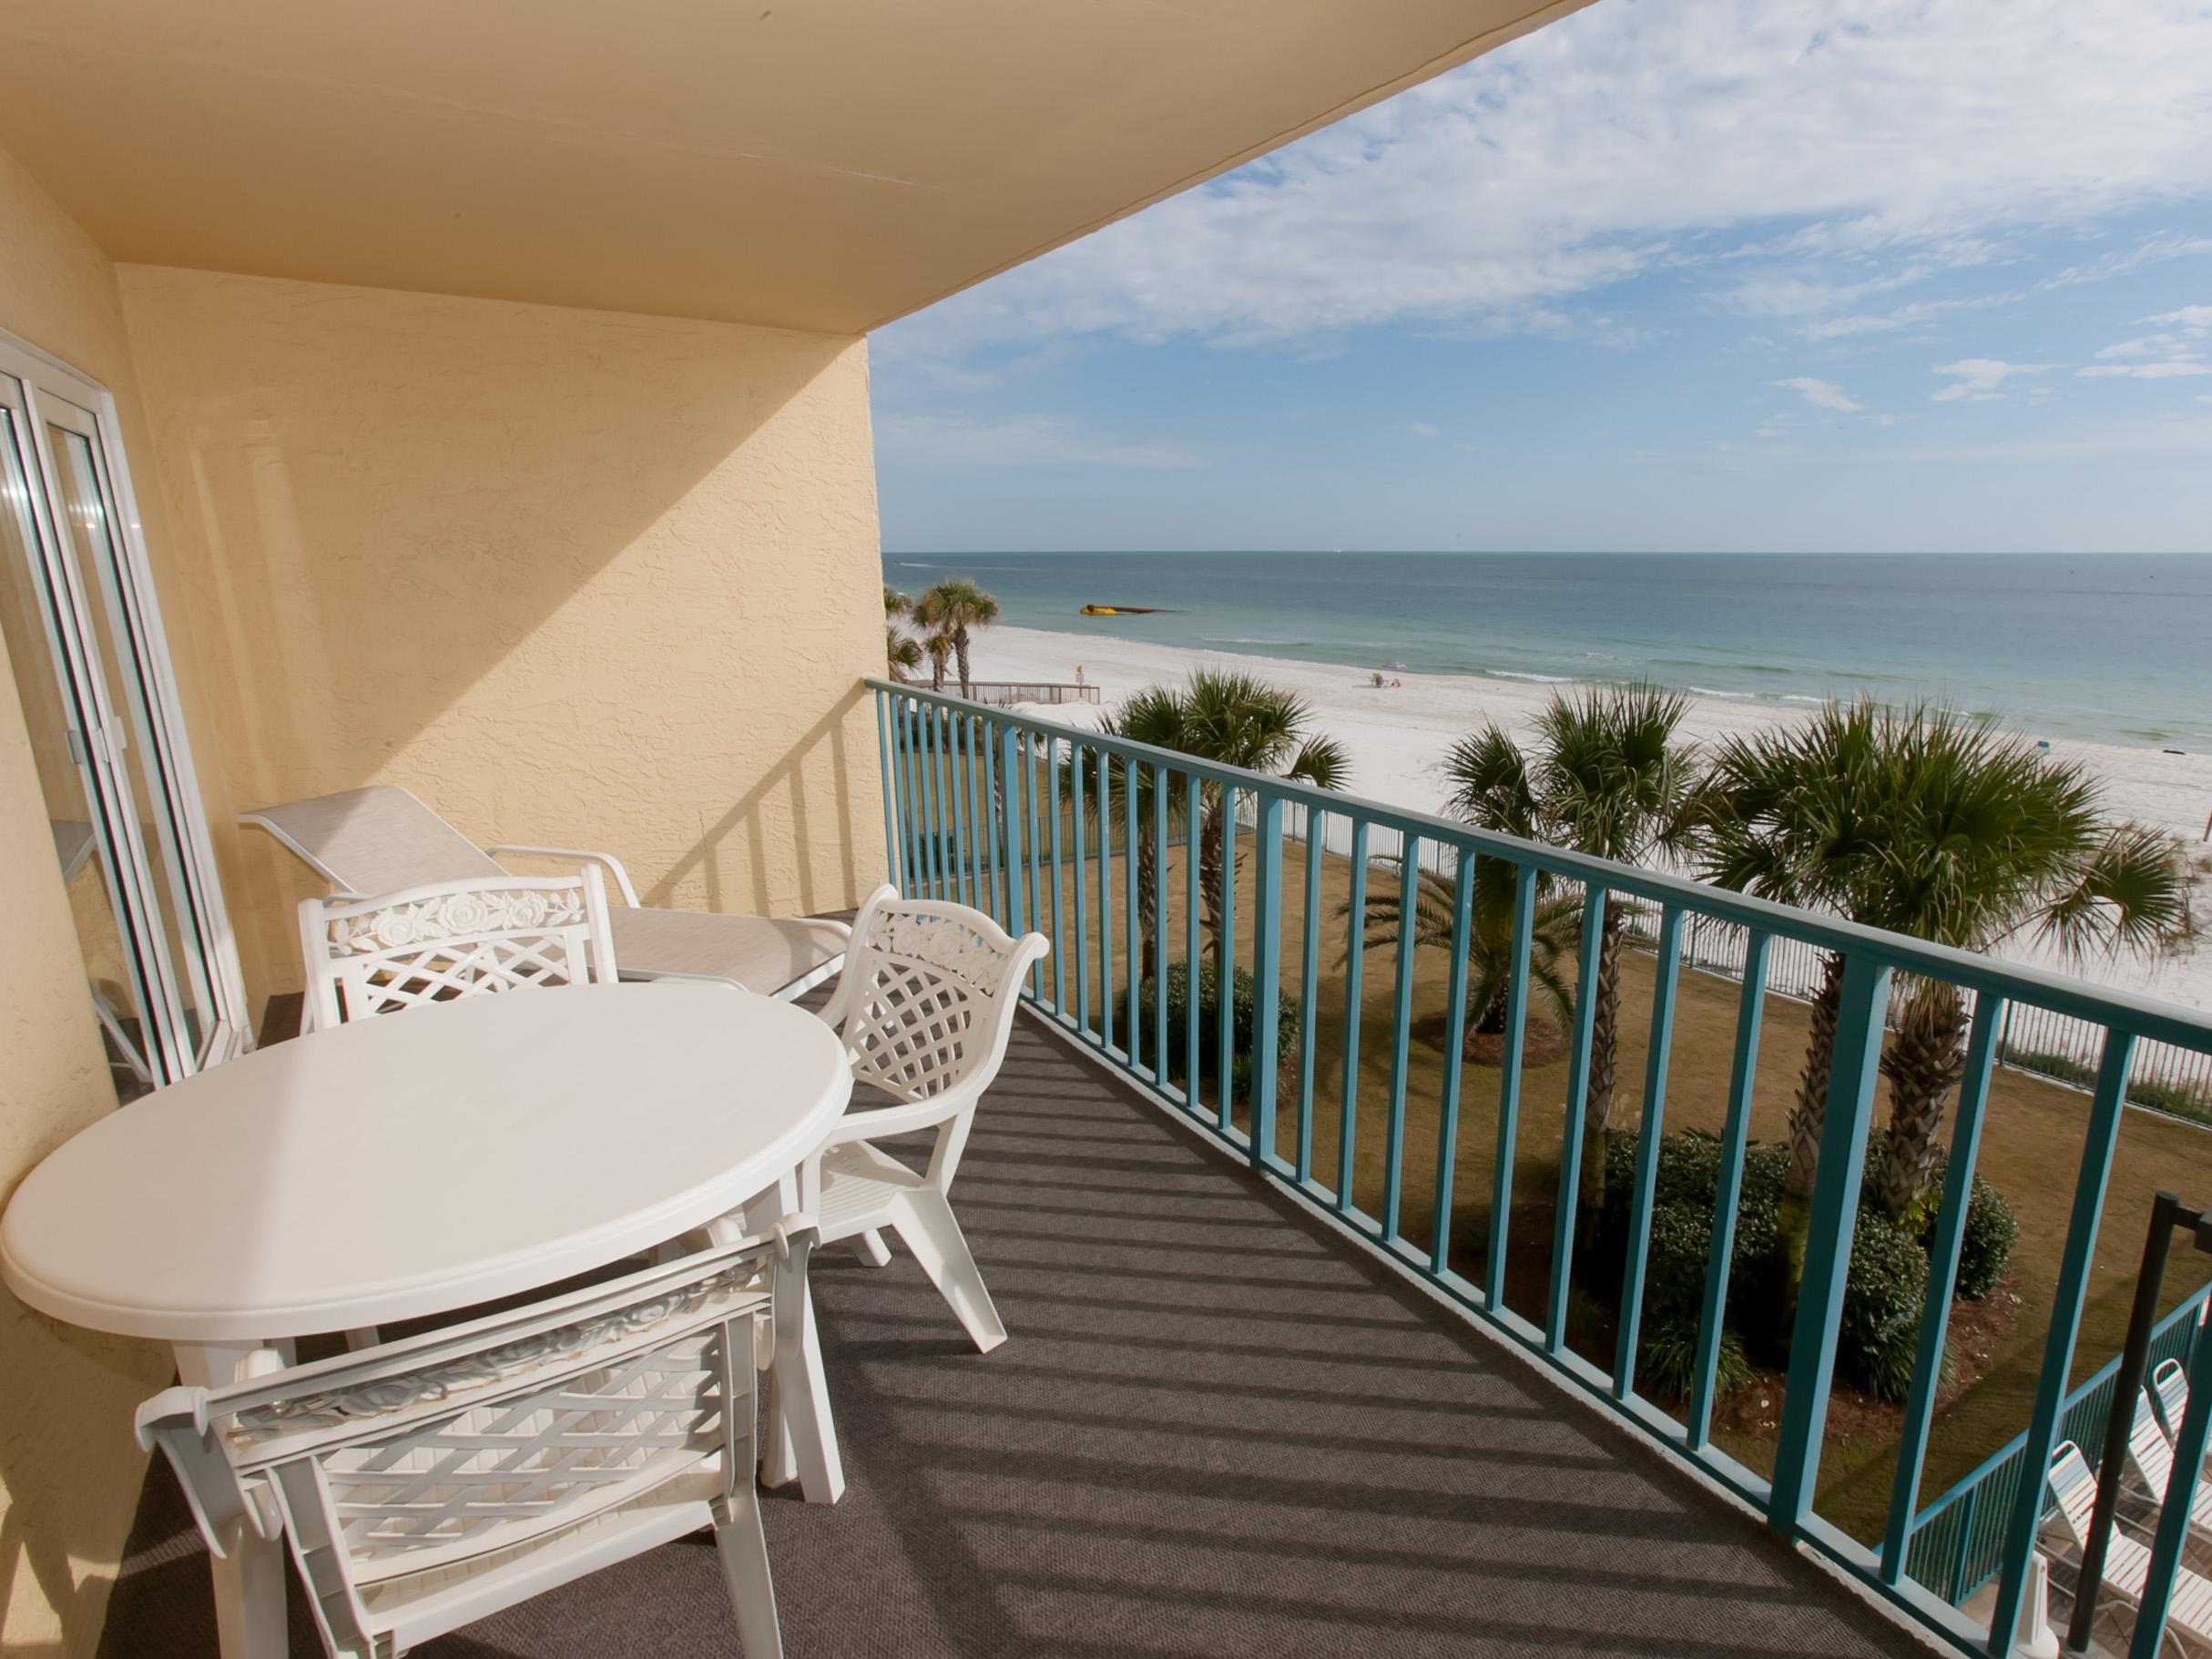 Surf Side Shores 2303 Condo rental in Surfside Shores - Gulf Shores in Gulf Shores Alabama - #26